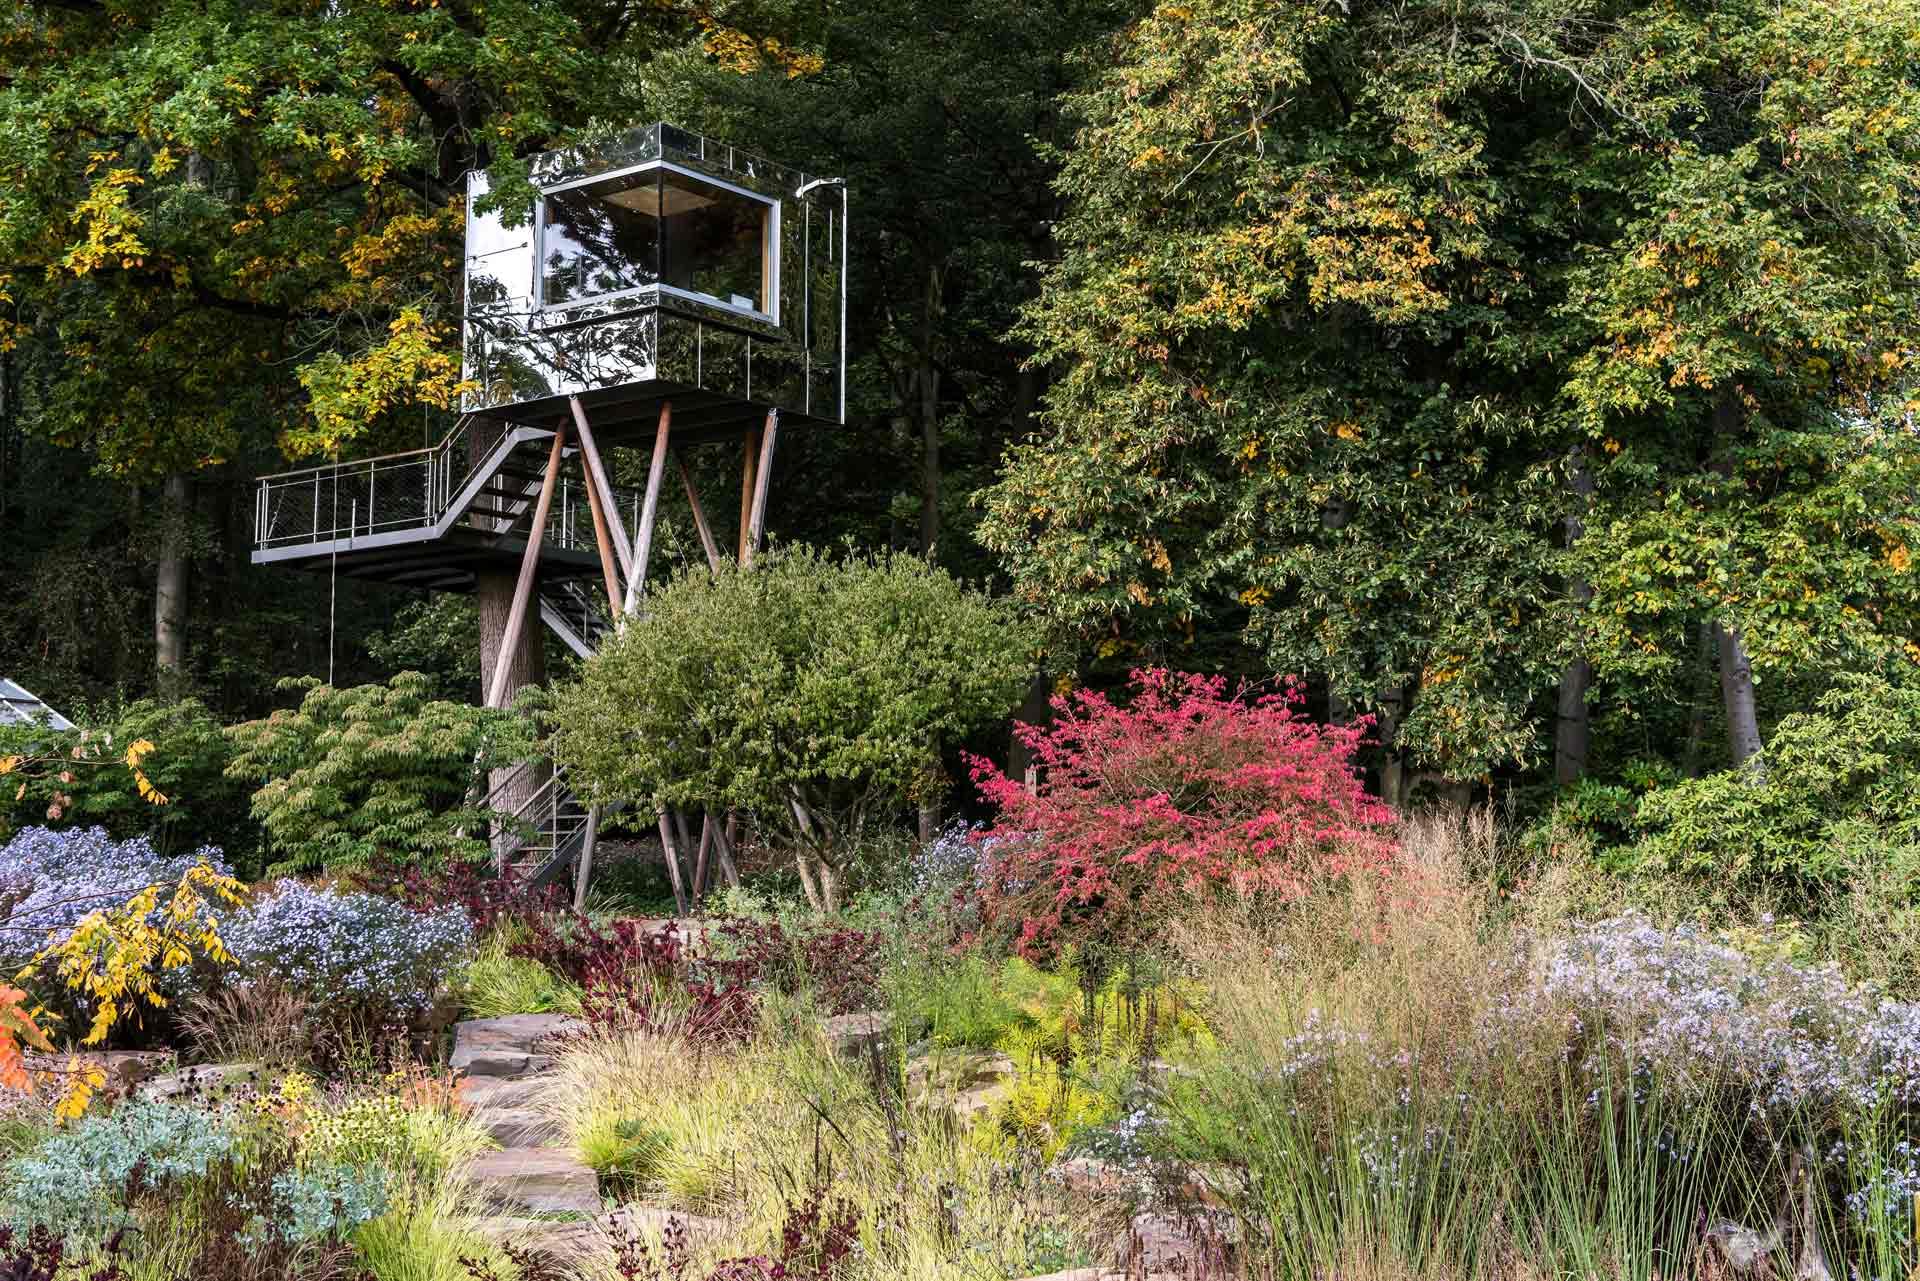 Gläsernes Gartenhaus in vielfältigem Naturgarten